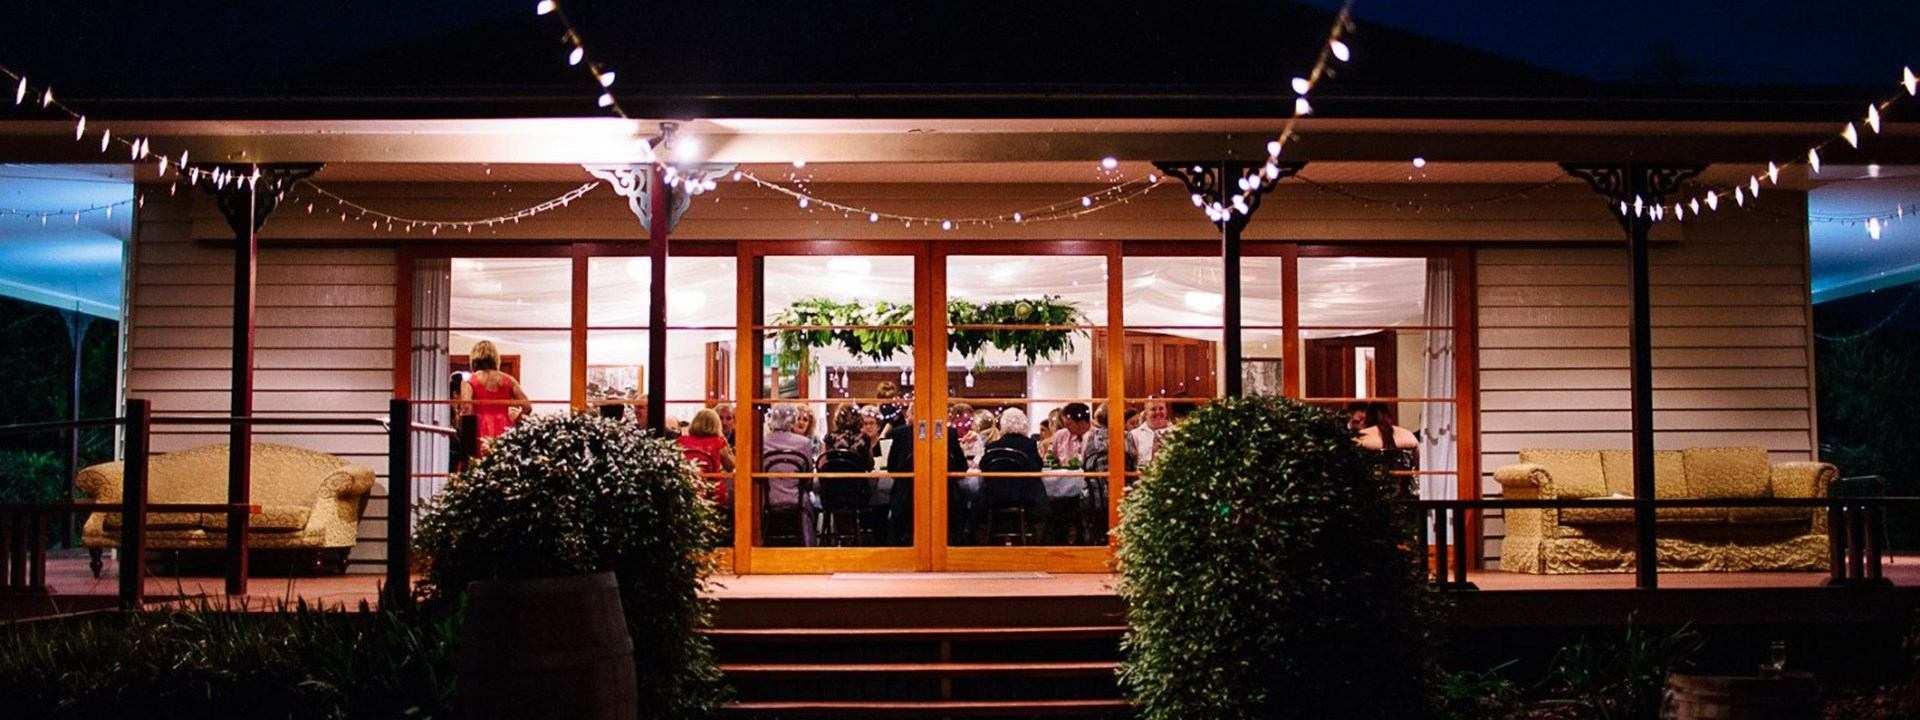 Wedding Venue - Spicers Hidden Vale - The Laidley Room 1 on Veilability